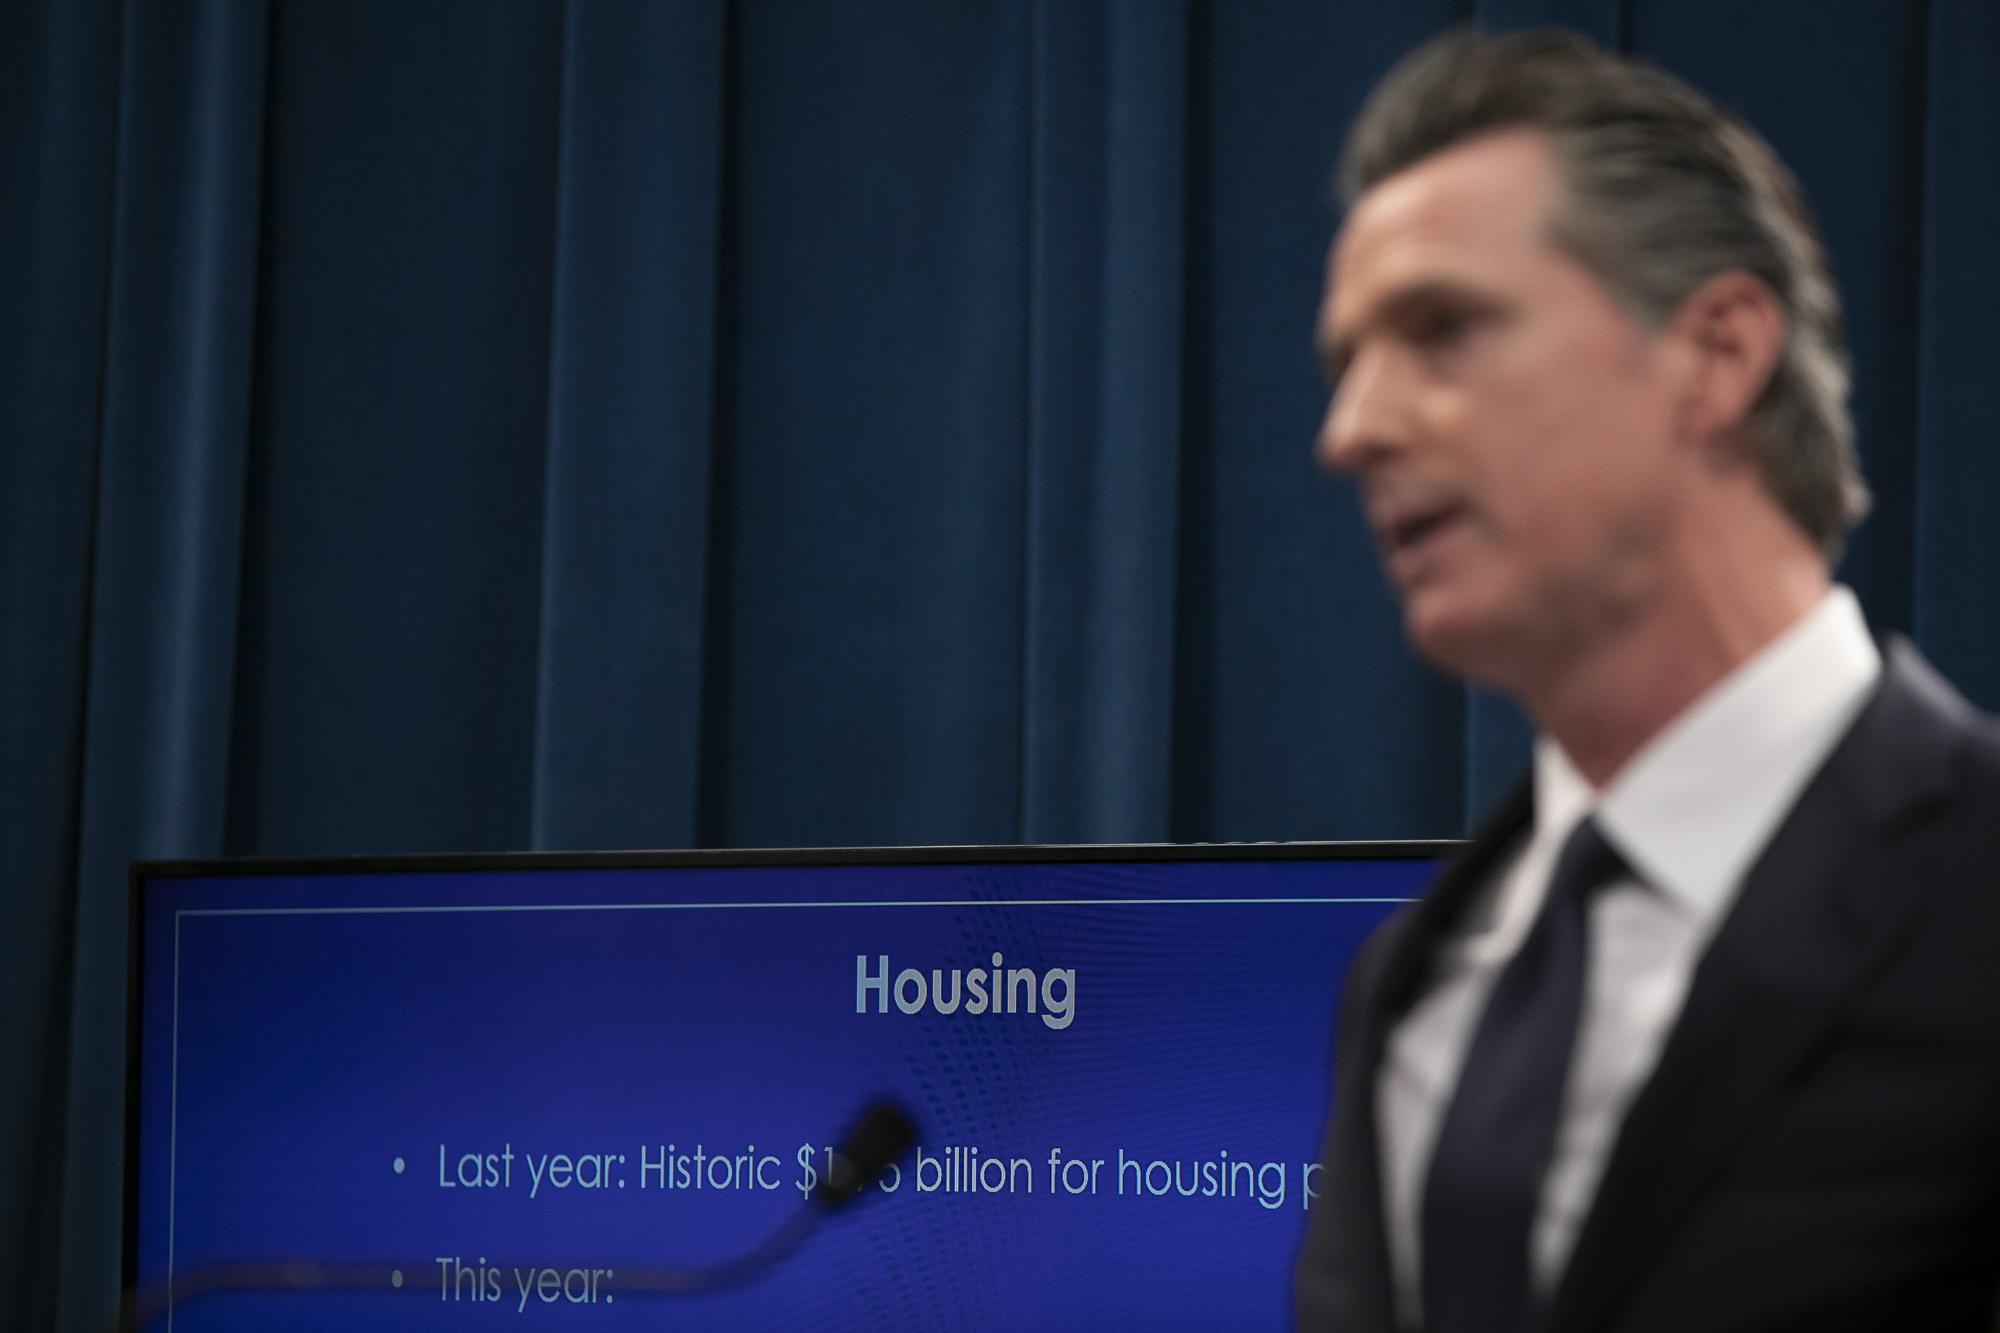 Victorious in recall, Gavin Newsom refocuses on California housing crisis